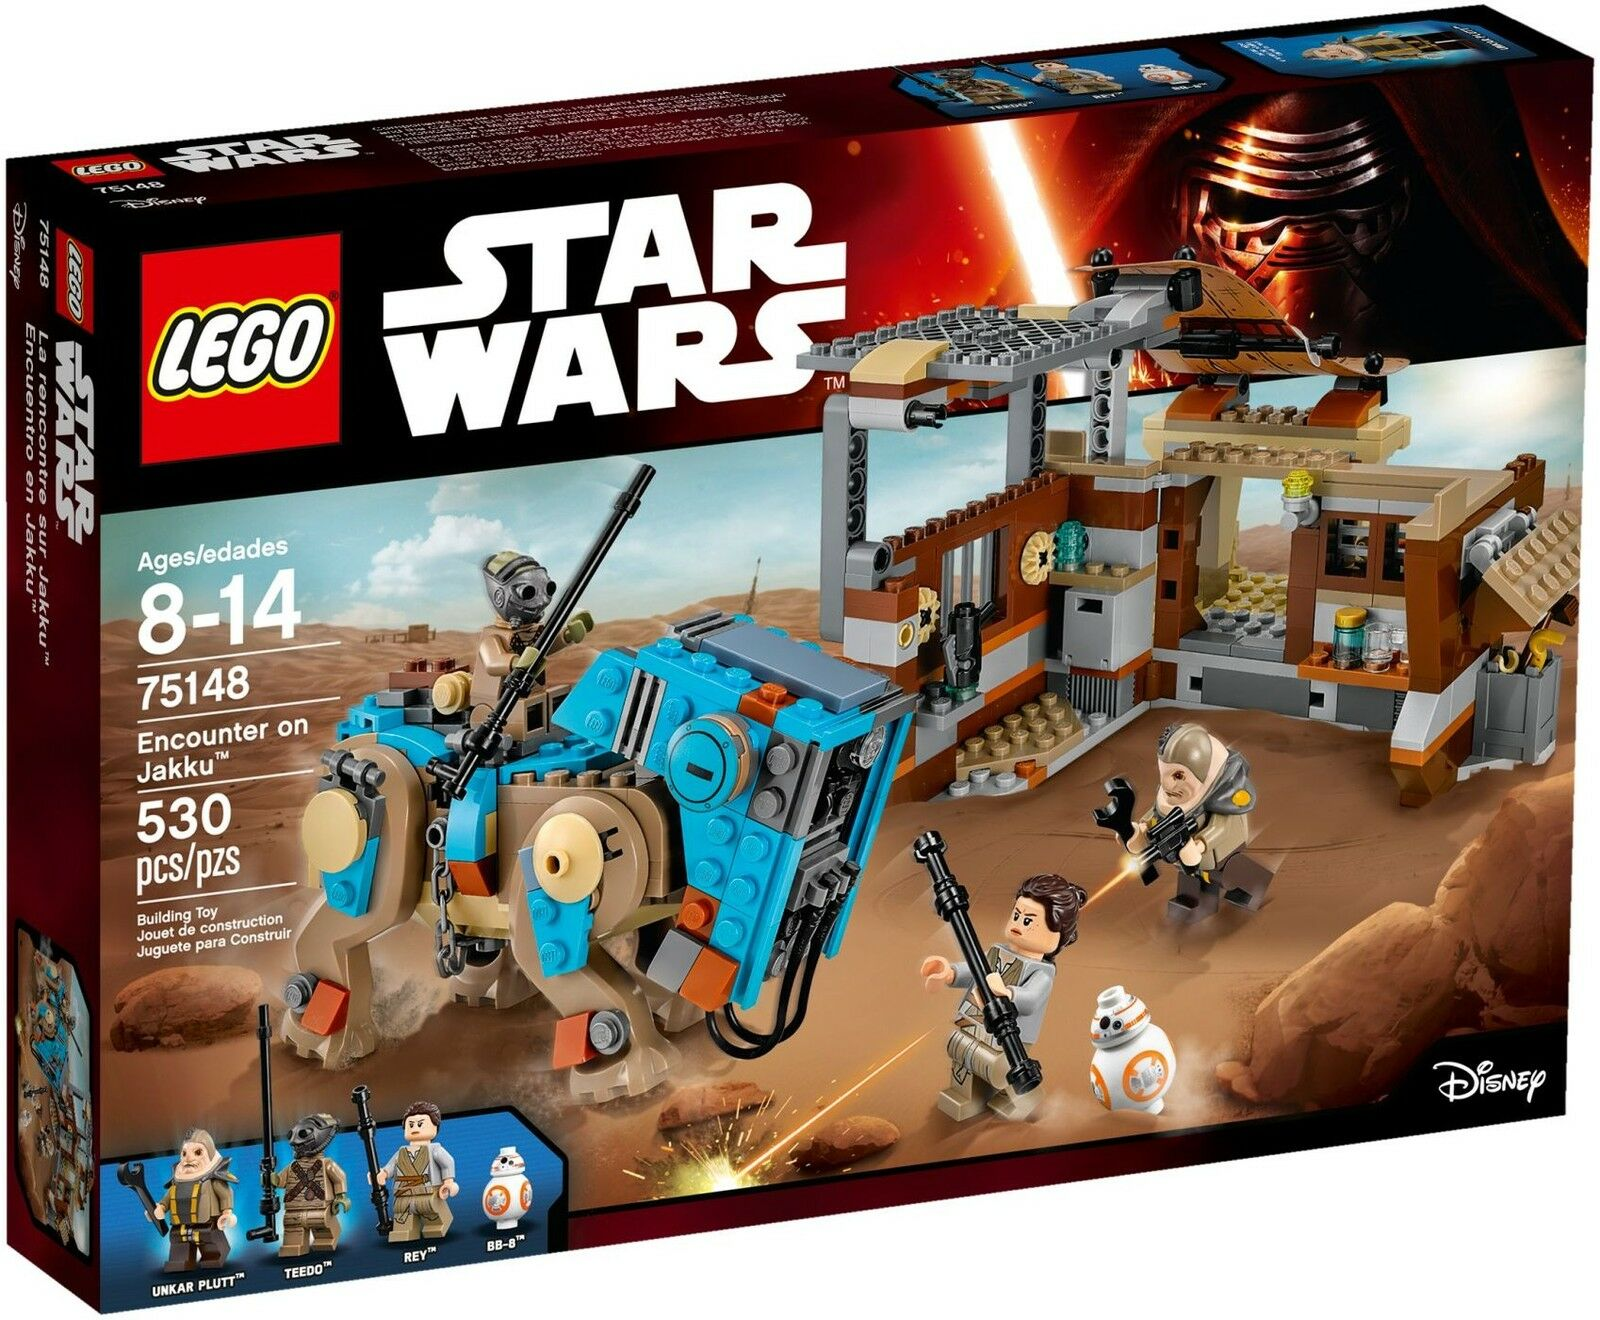 LEGO Star Wars - 75148 Encounter on Jakku M. Unkar plutt-NUOVO OVP  danno MAGAZZINO